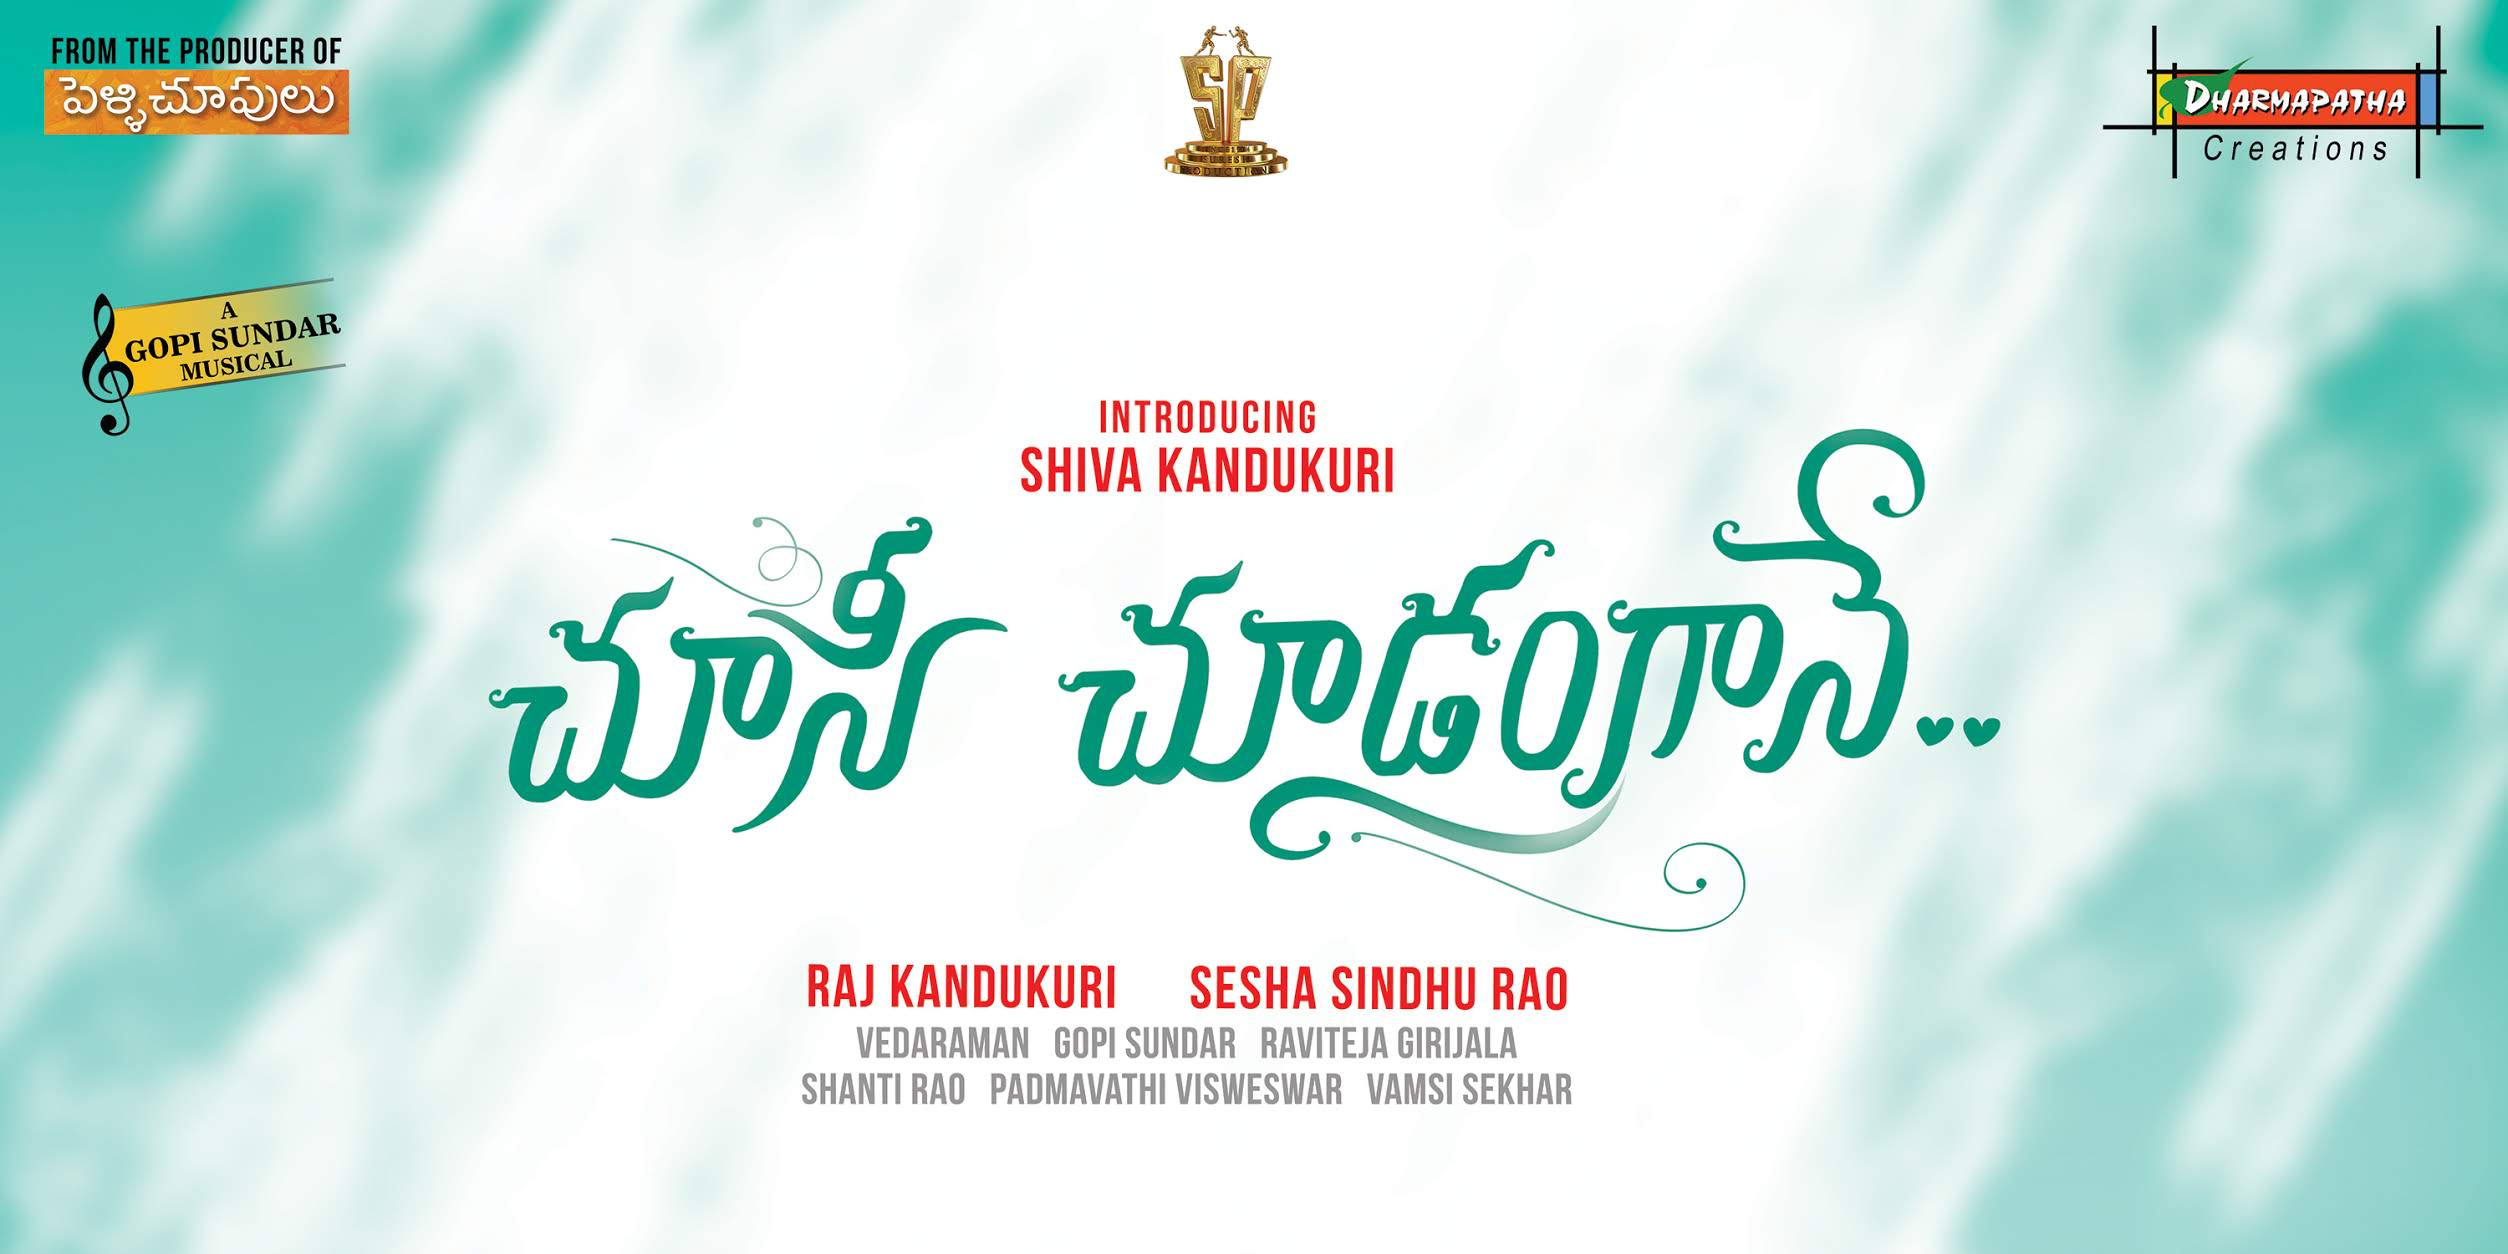 "Producer Raj Kandukuri""s son Shiva Kandukuri's debut film titled 'Choosi Choodangaane'"